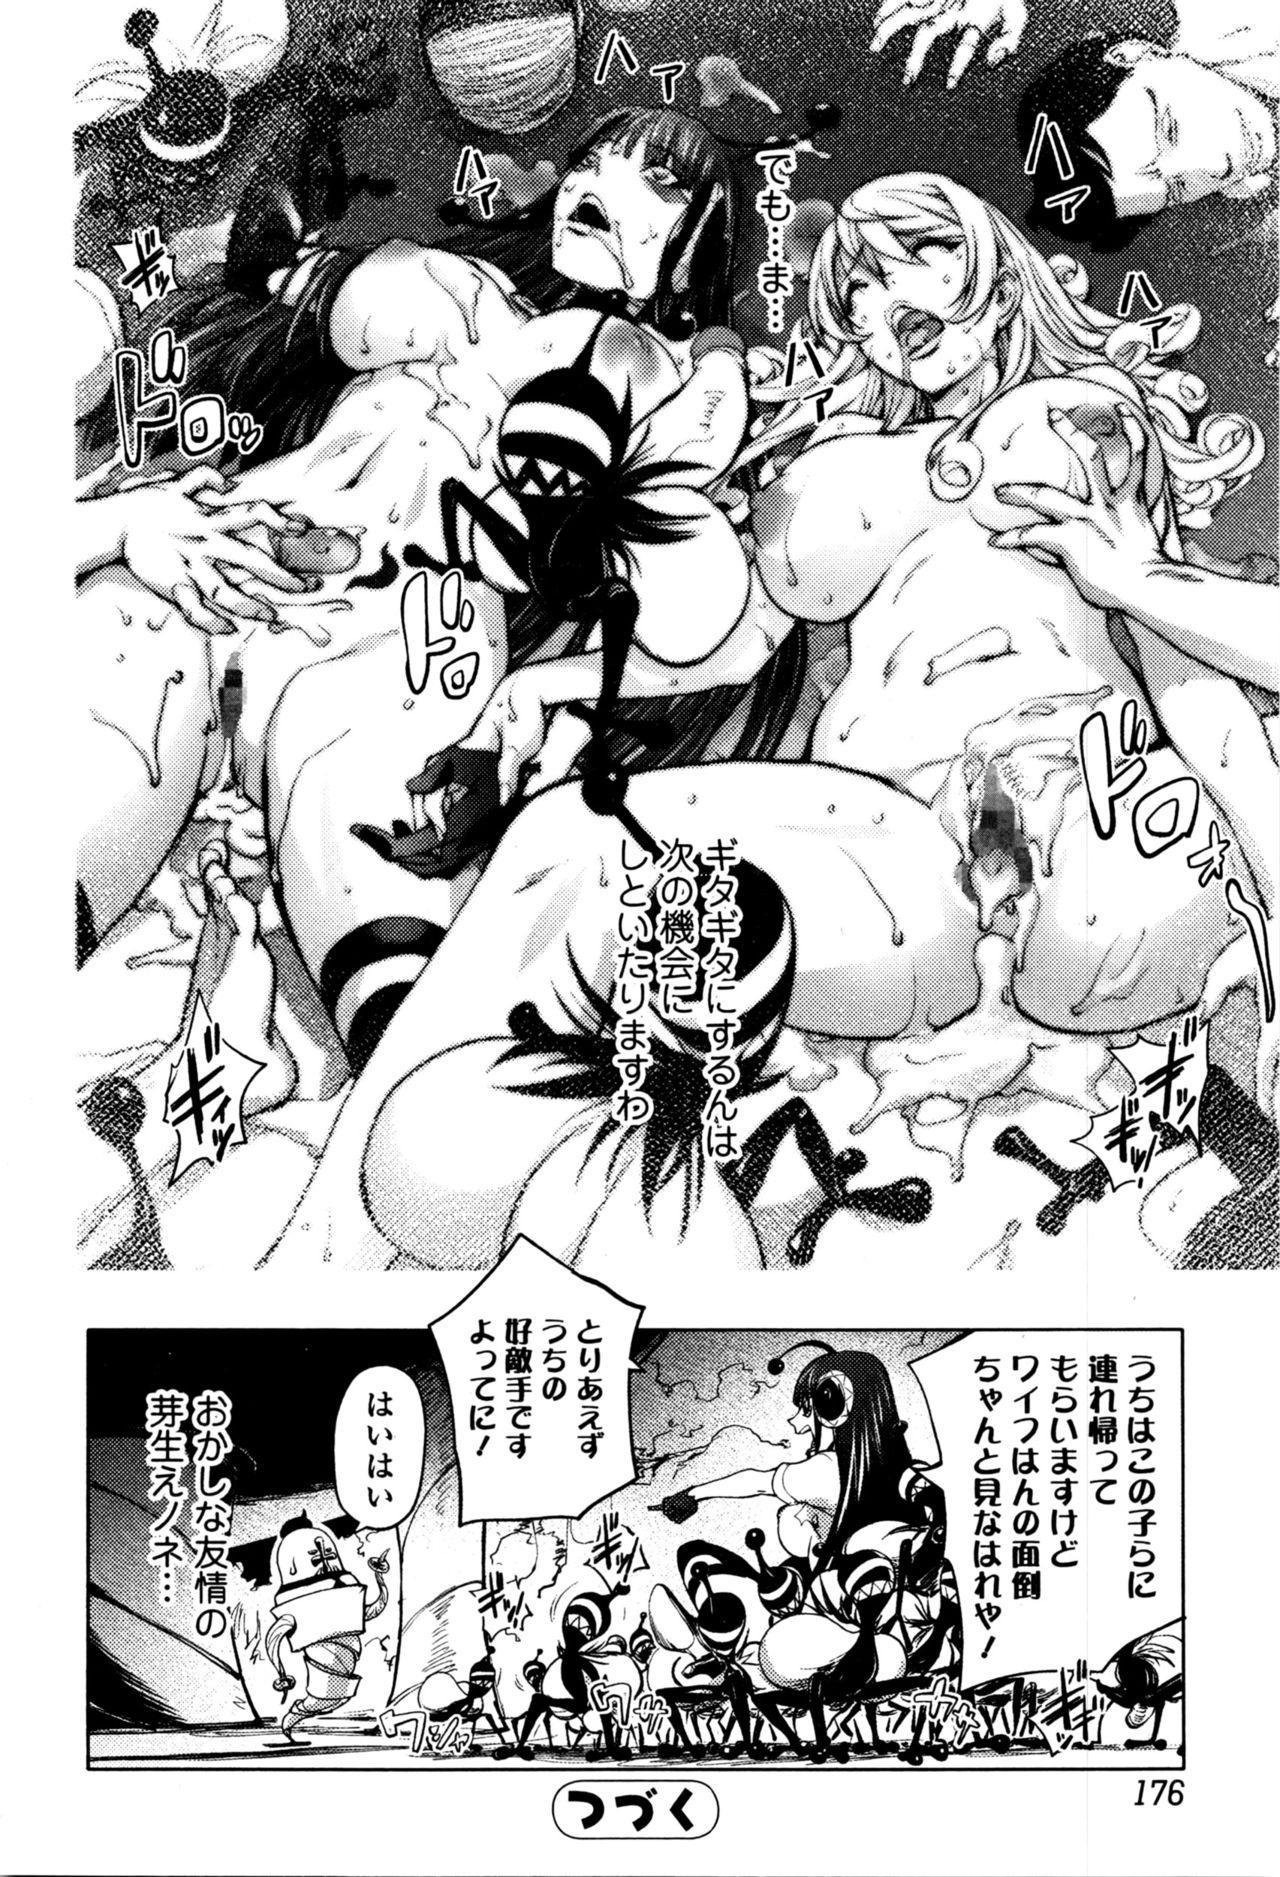 Comic JSCK Vol.4 2016-05 176